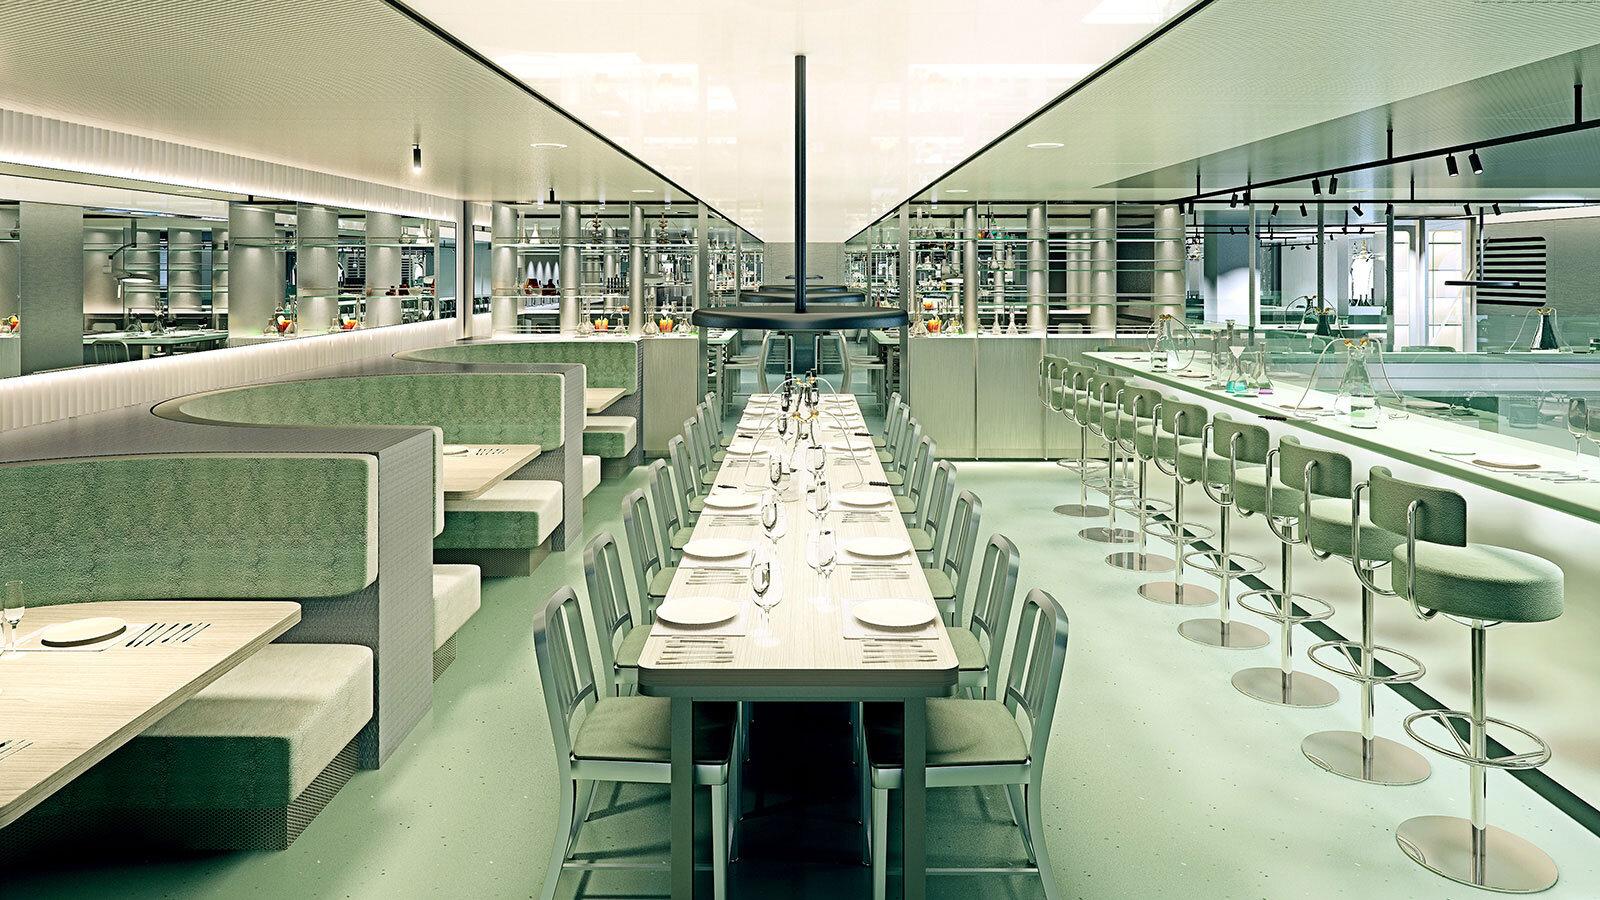 RDR-FNB-ma-cuisine-restaurant-communal-table-v1-01-1600x900.jpg